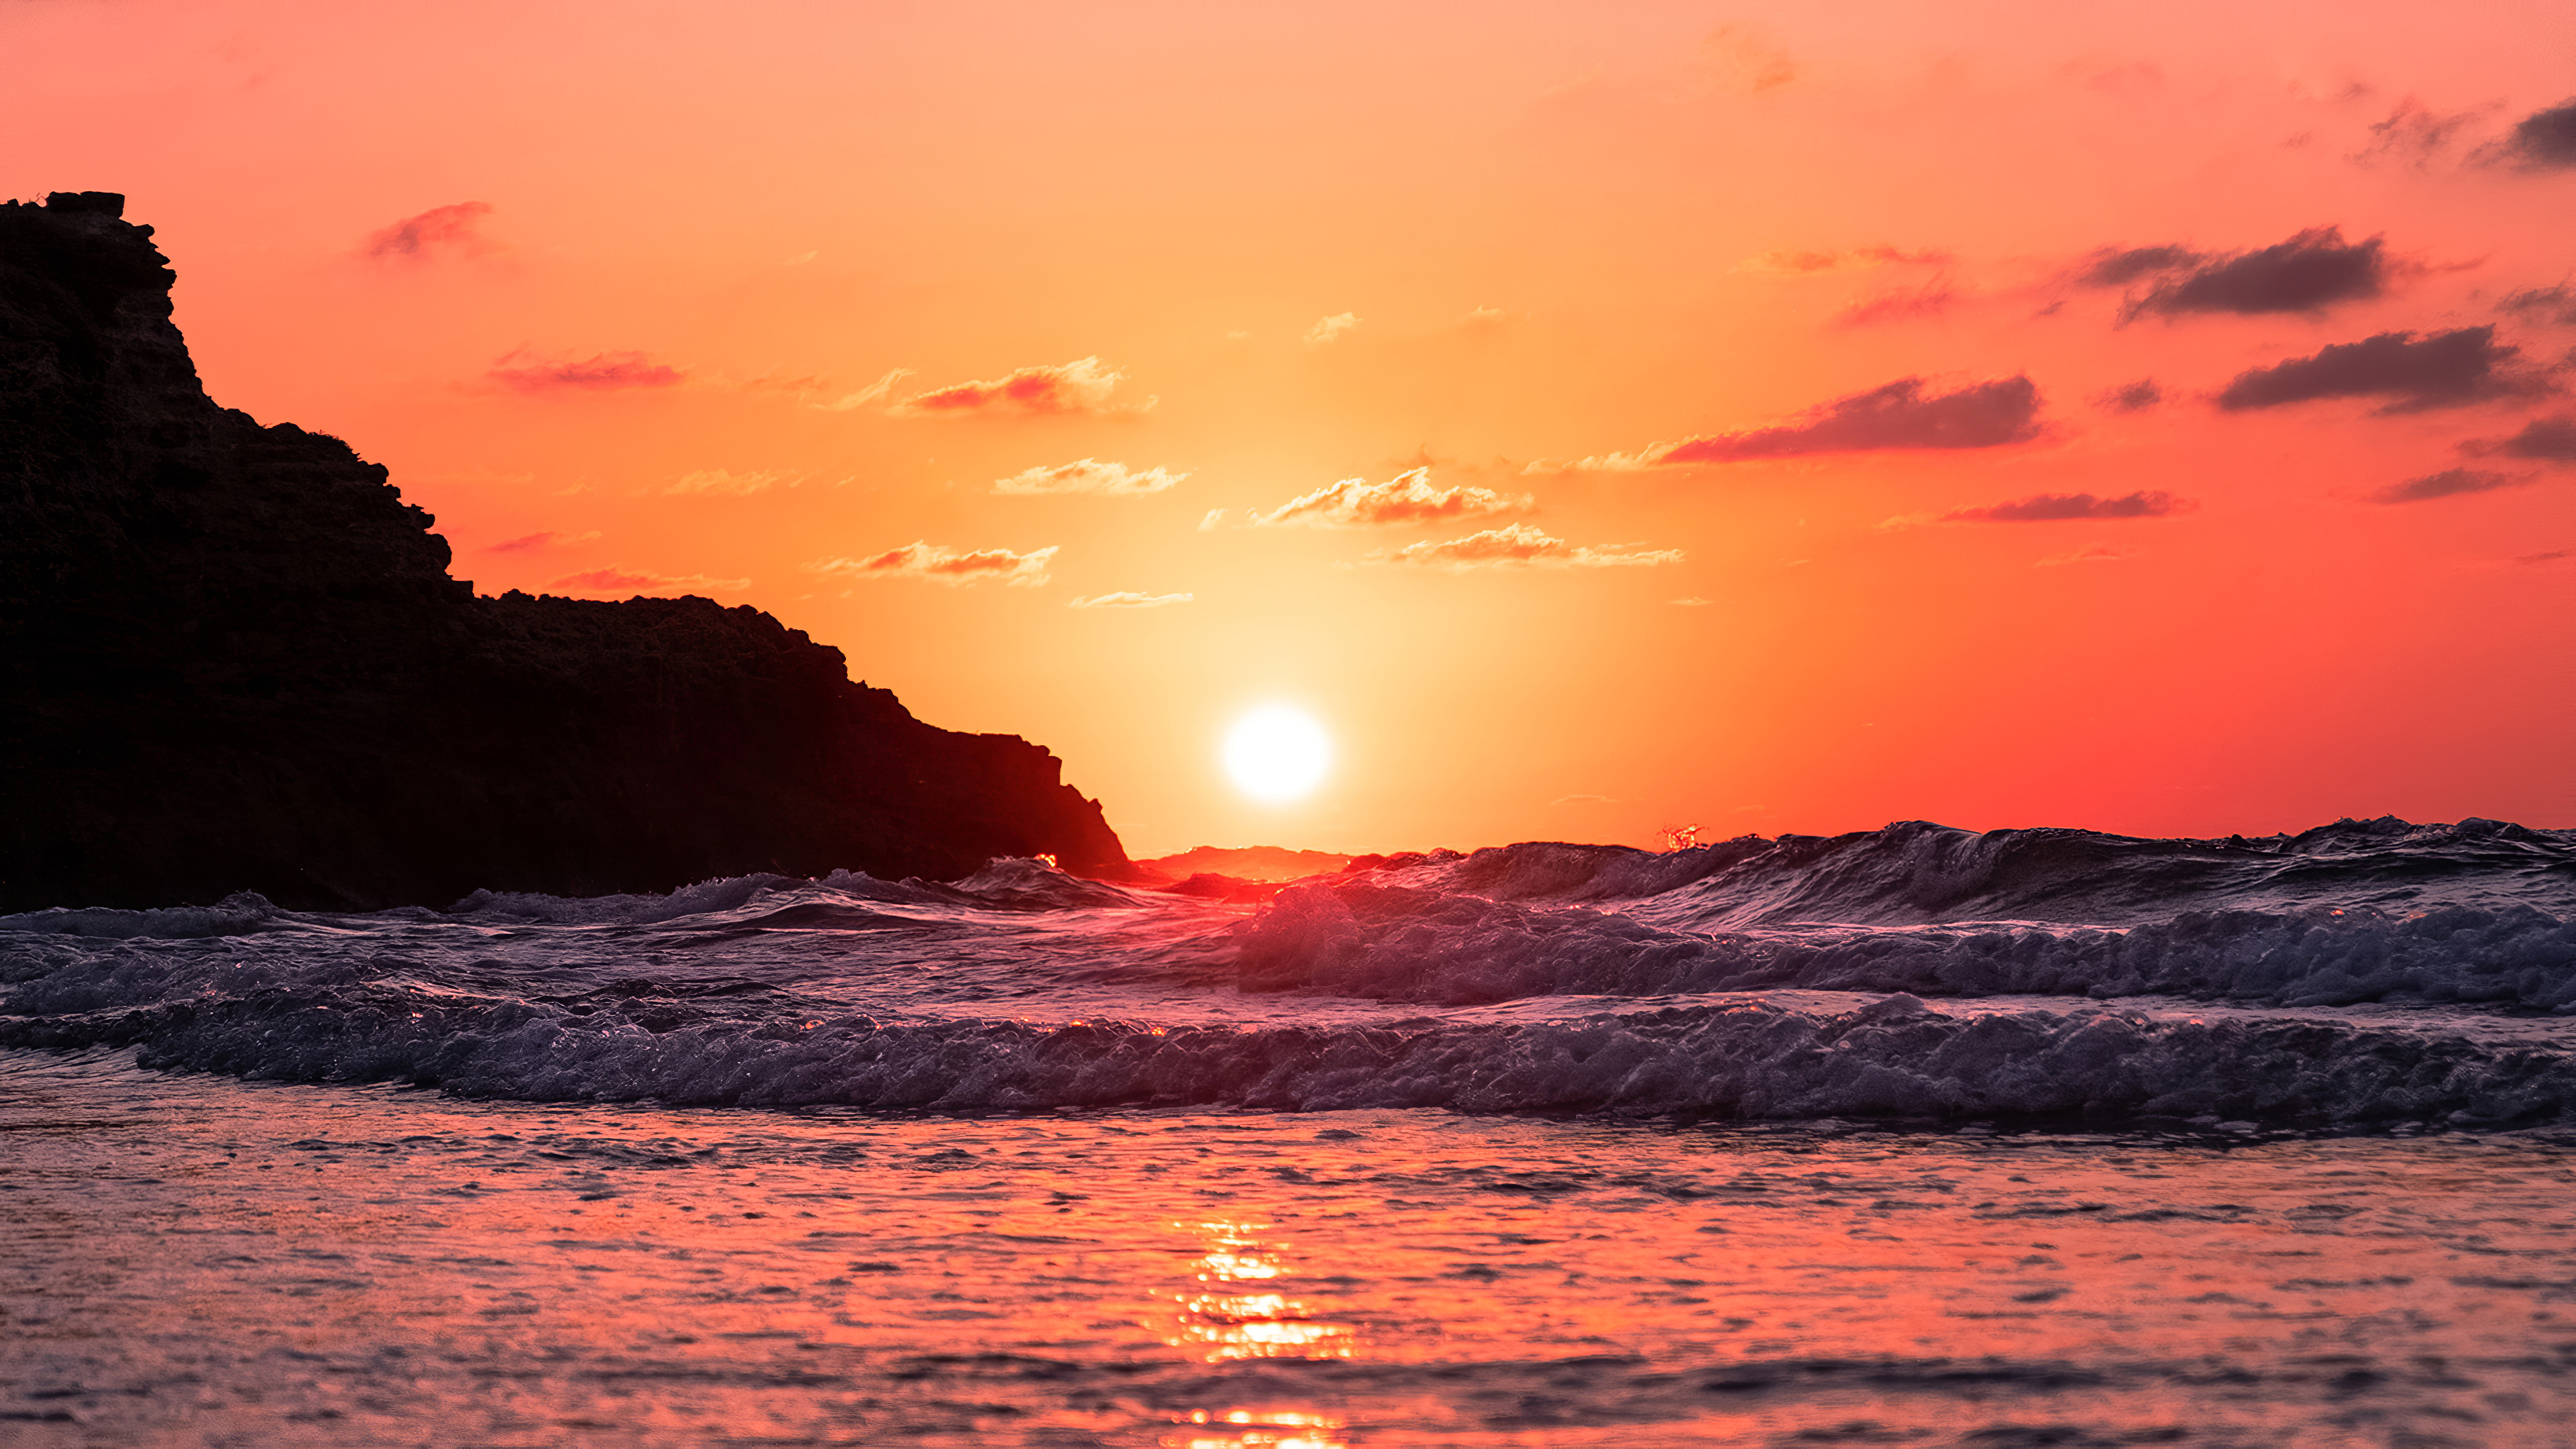 waves ocean sunset 1574937849 - Waves Ocean Sunset -